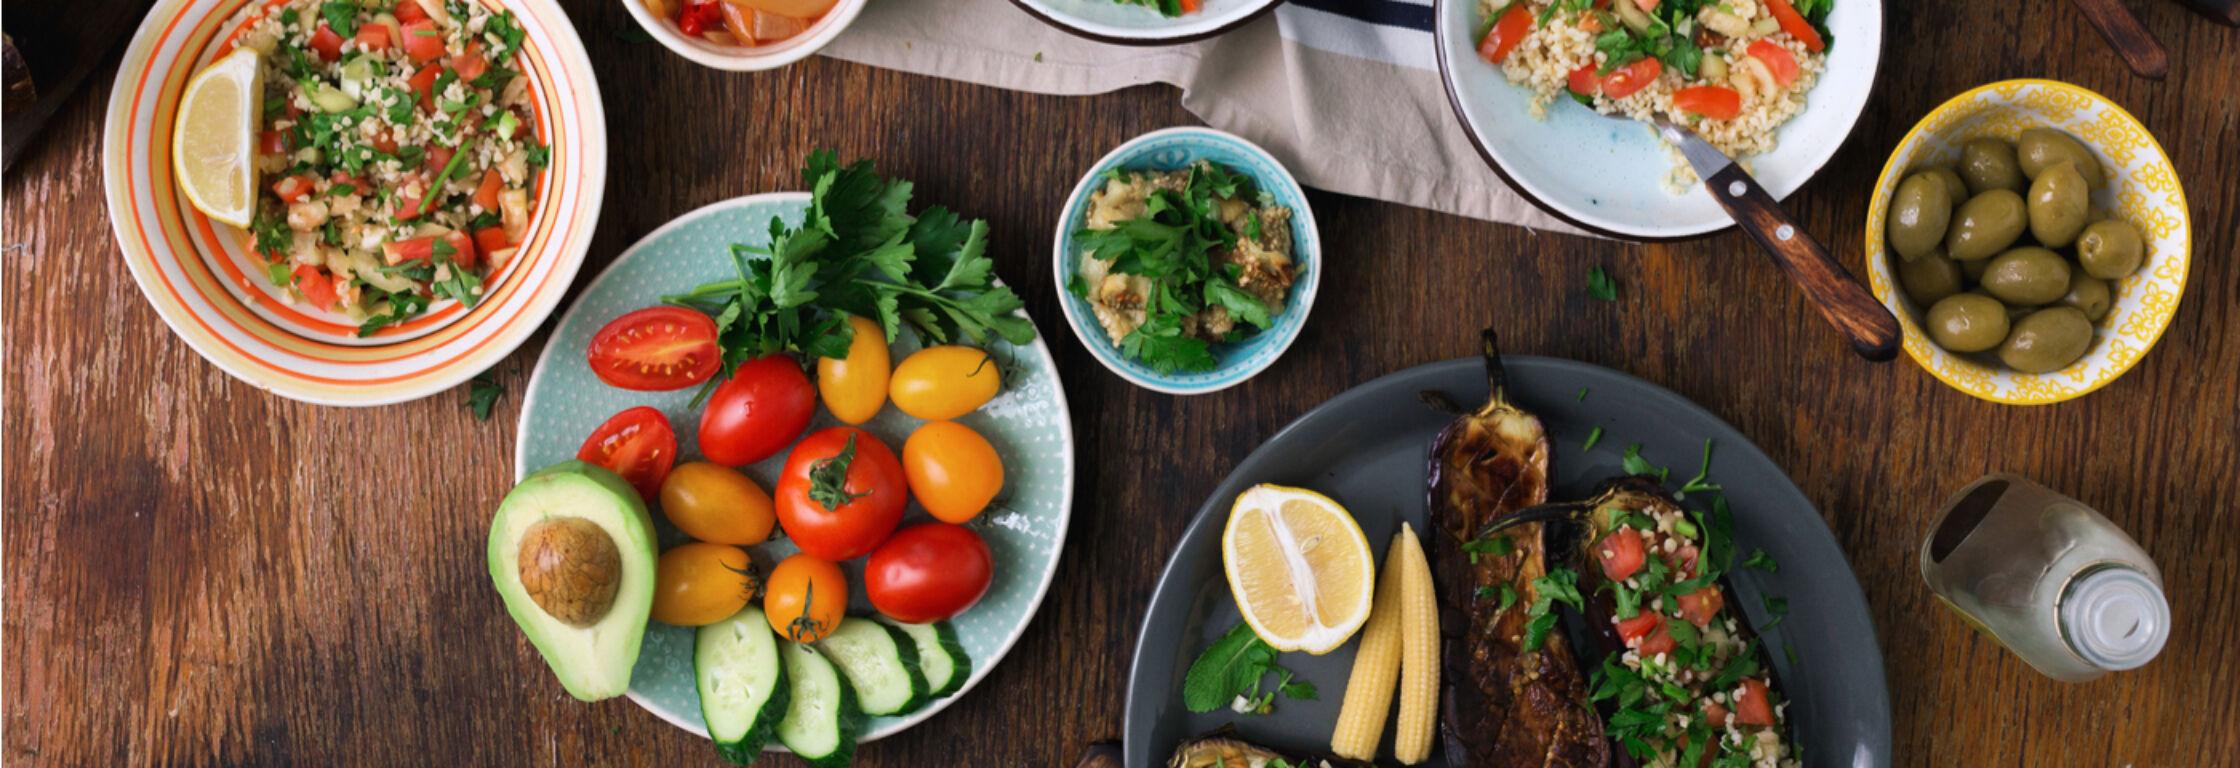 Vegetariër en hardlopen, hoe doe je dat?